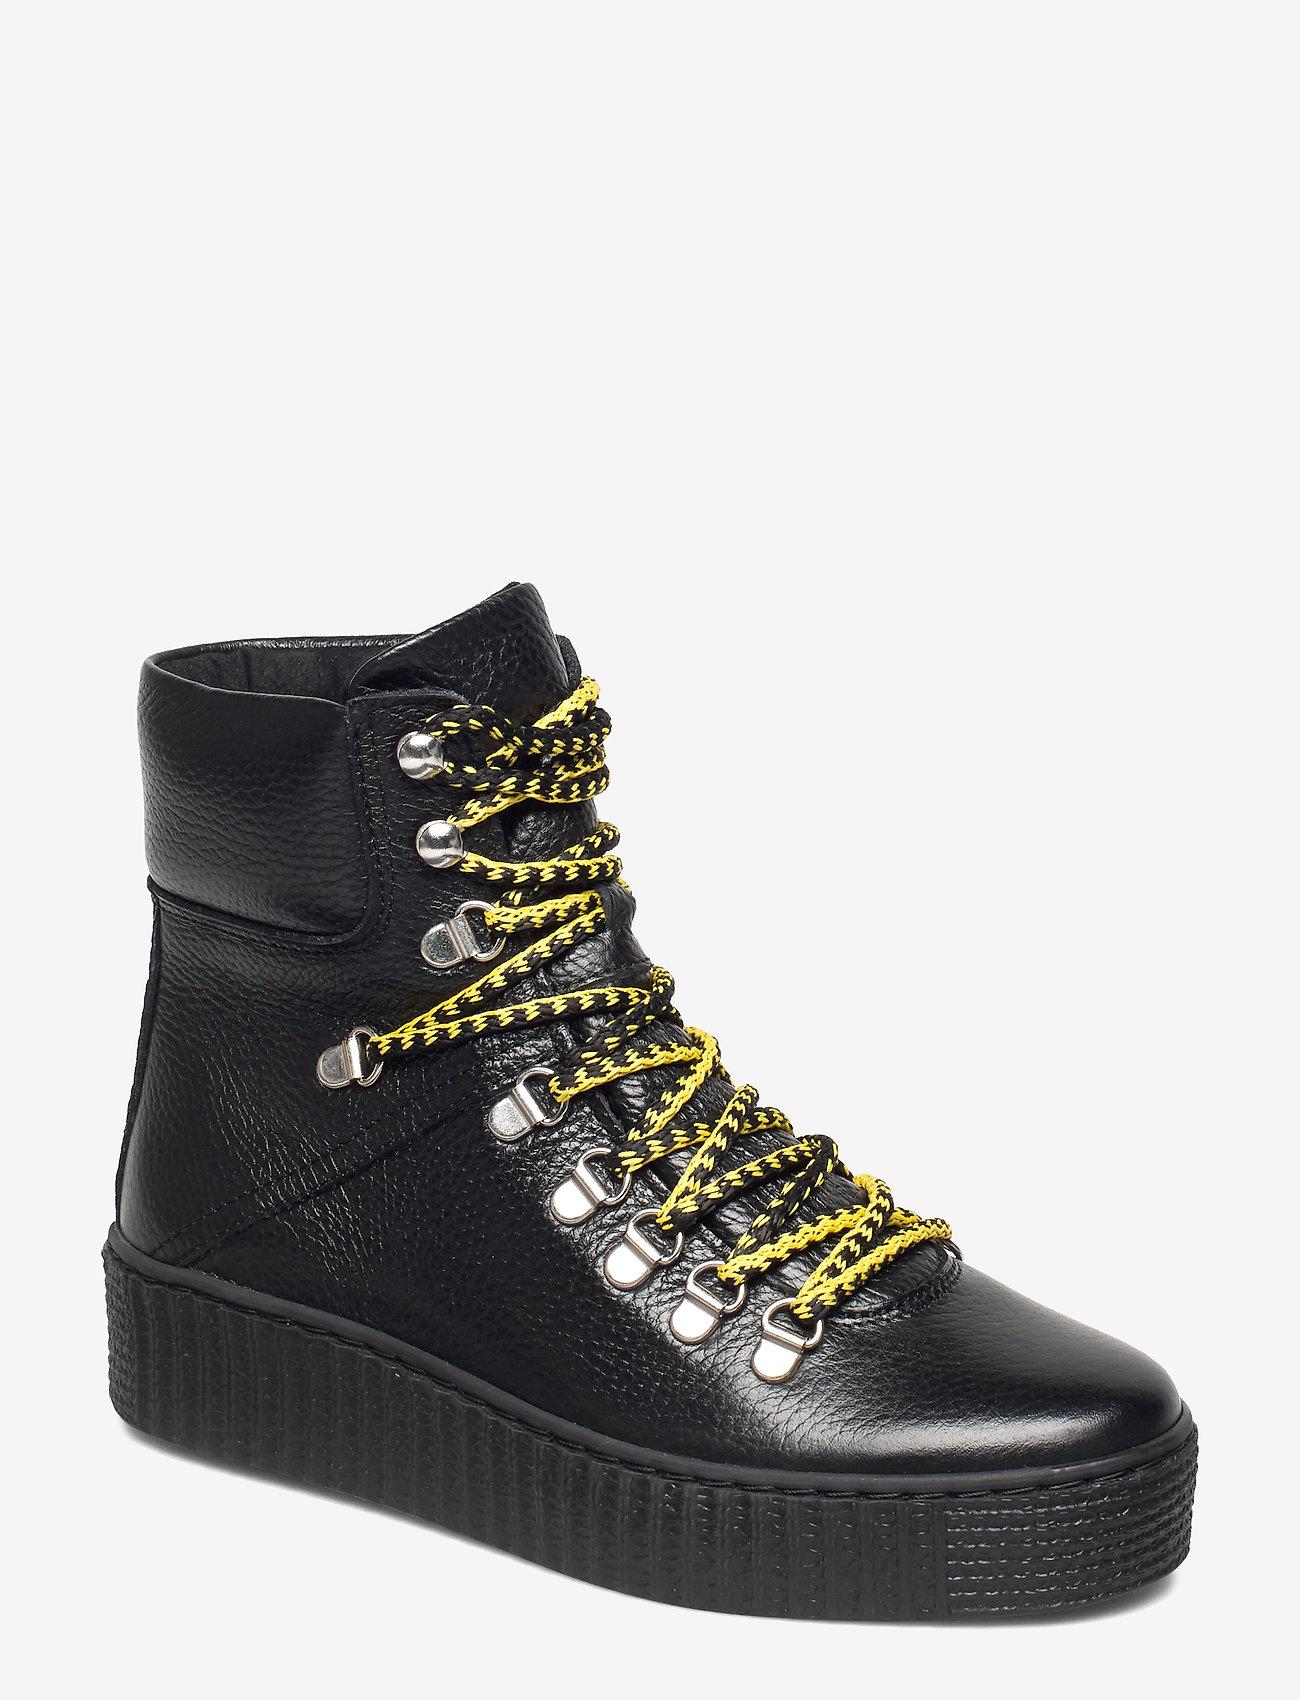 Shoe The Bear - AGDA L - flat ankle boots - black / black - 1